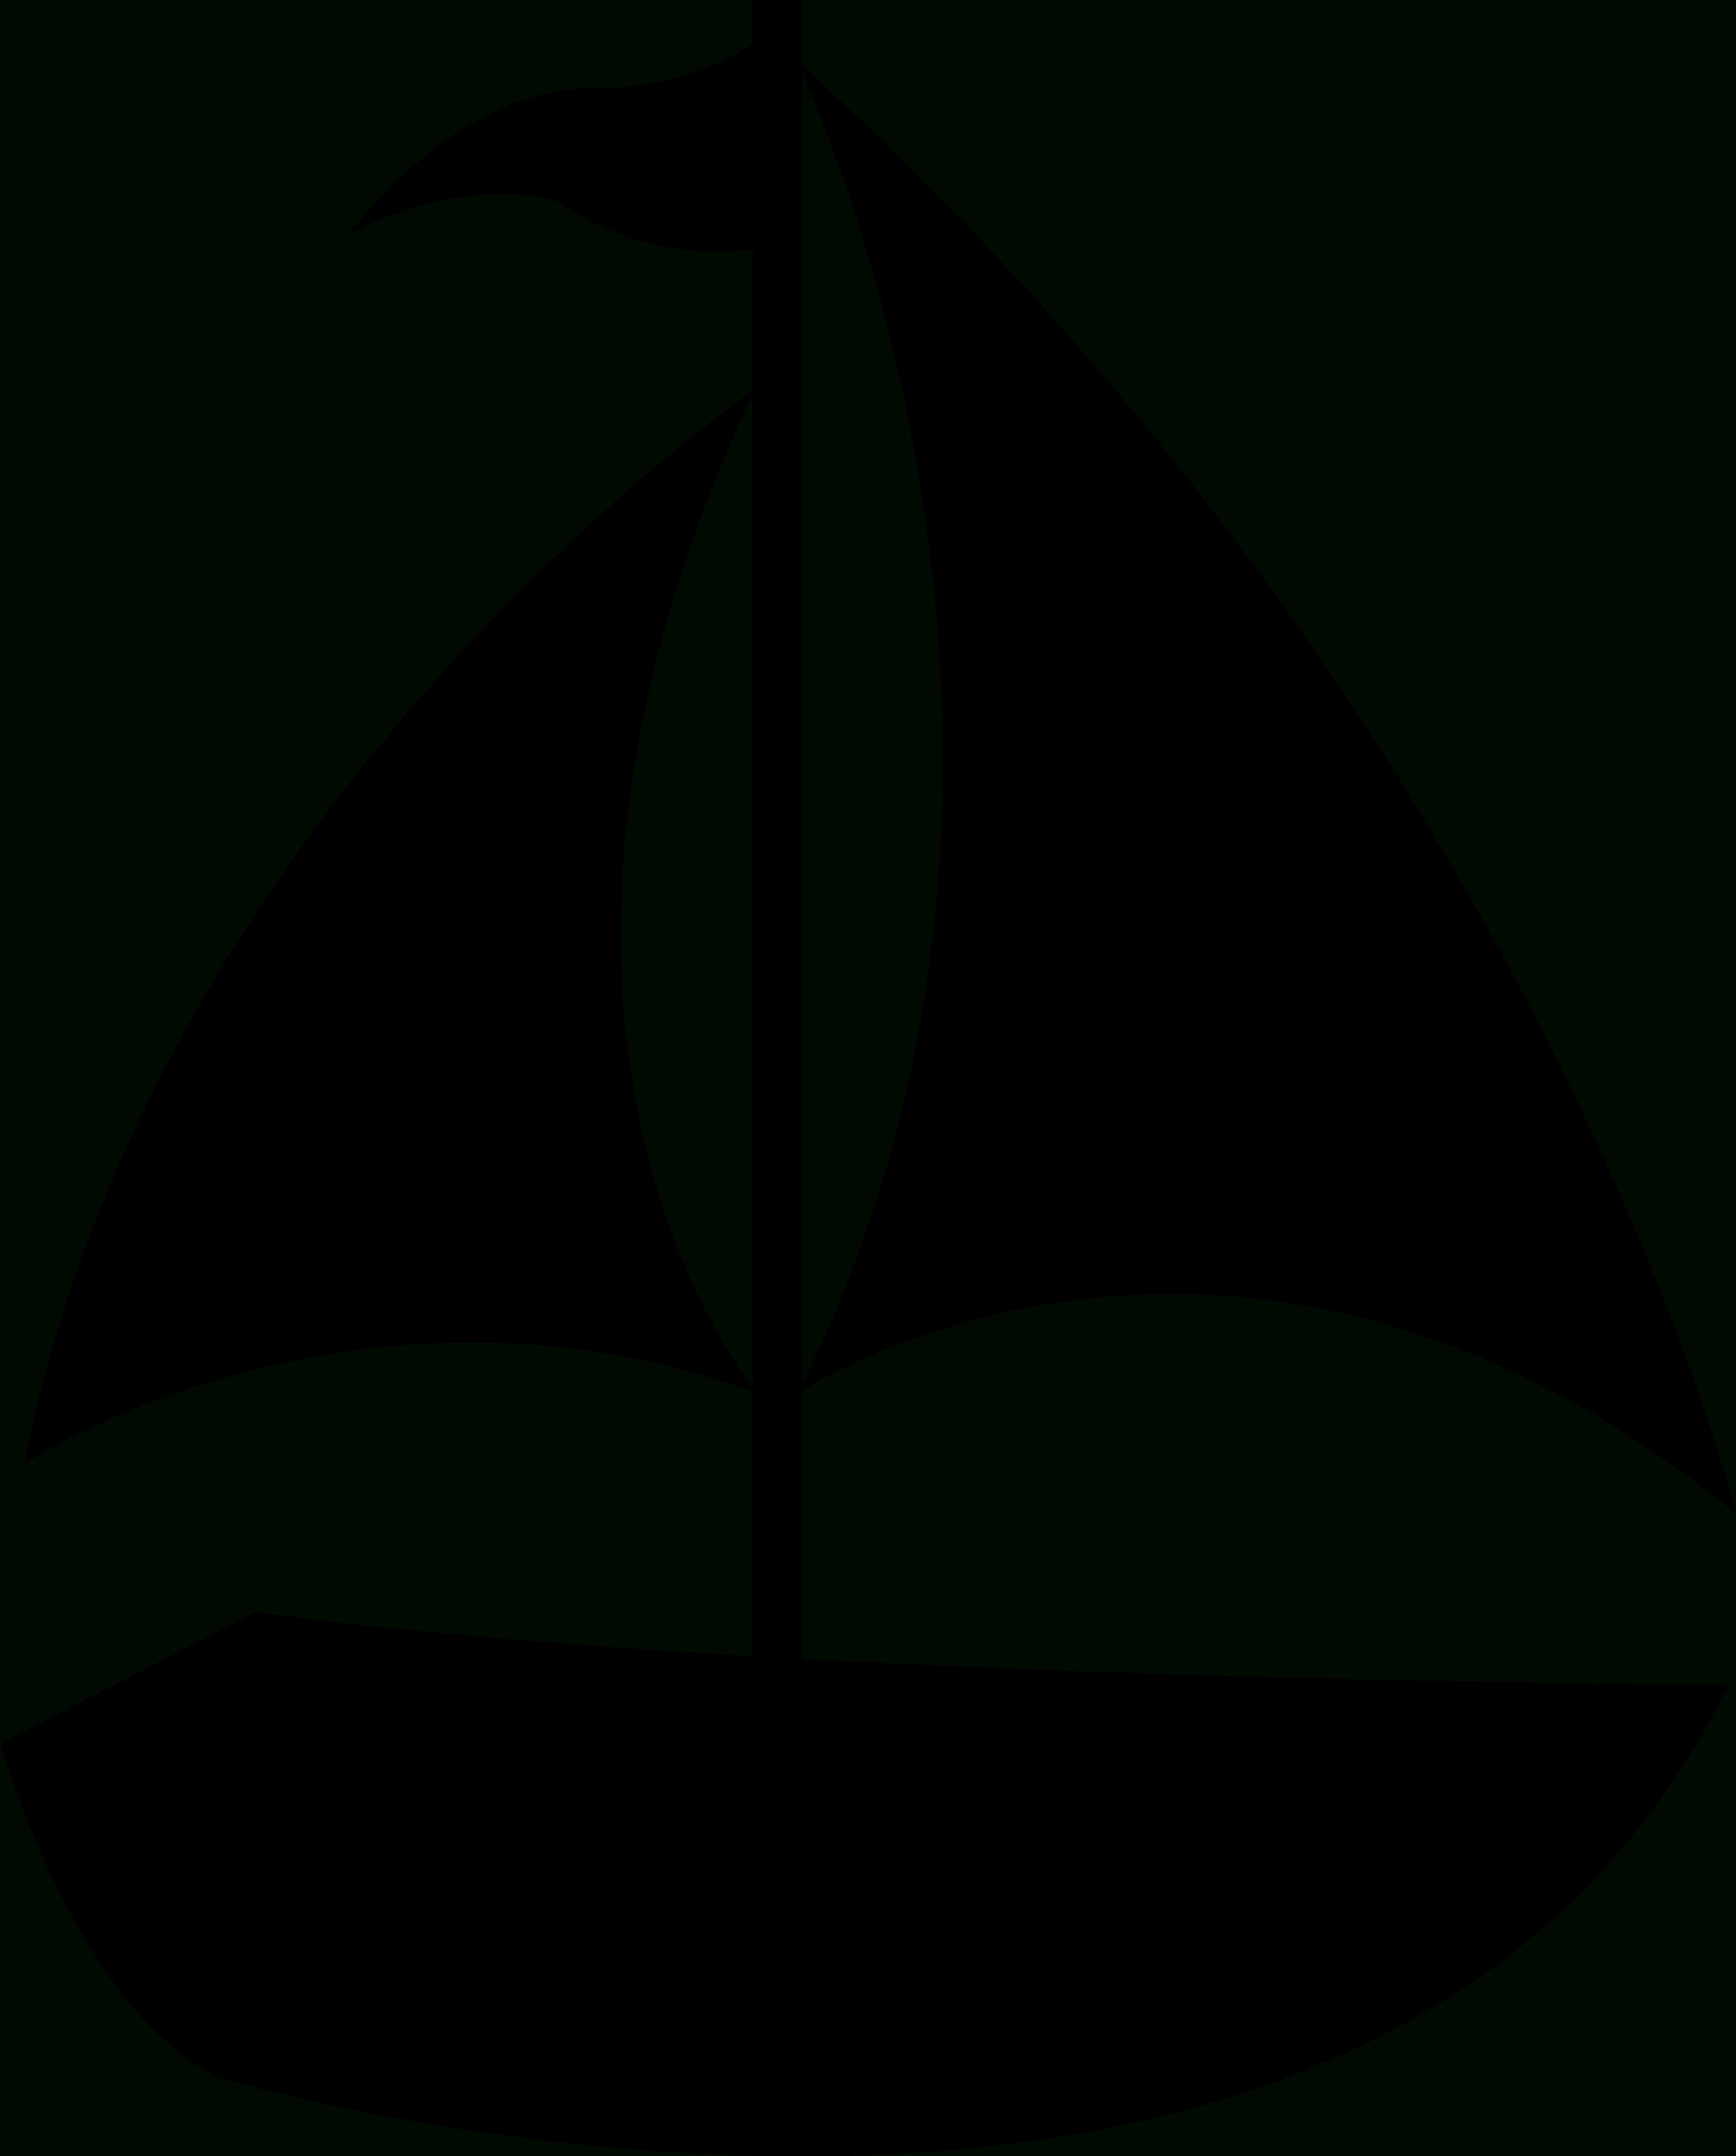 Free Sailboat Stencil, Download Free Clip Art, Free Clip Art On - Free Printable Sailboat Template